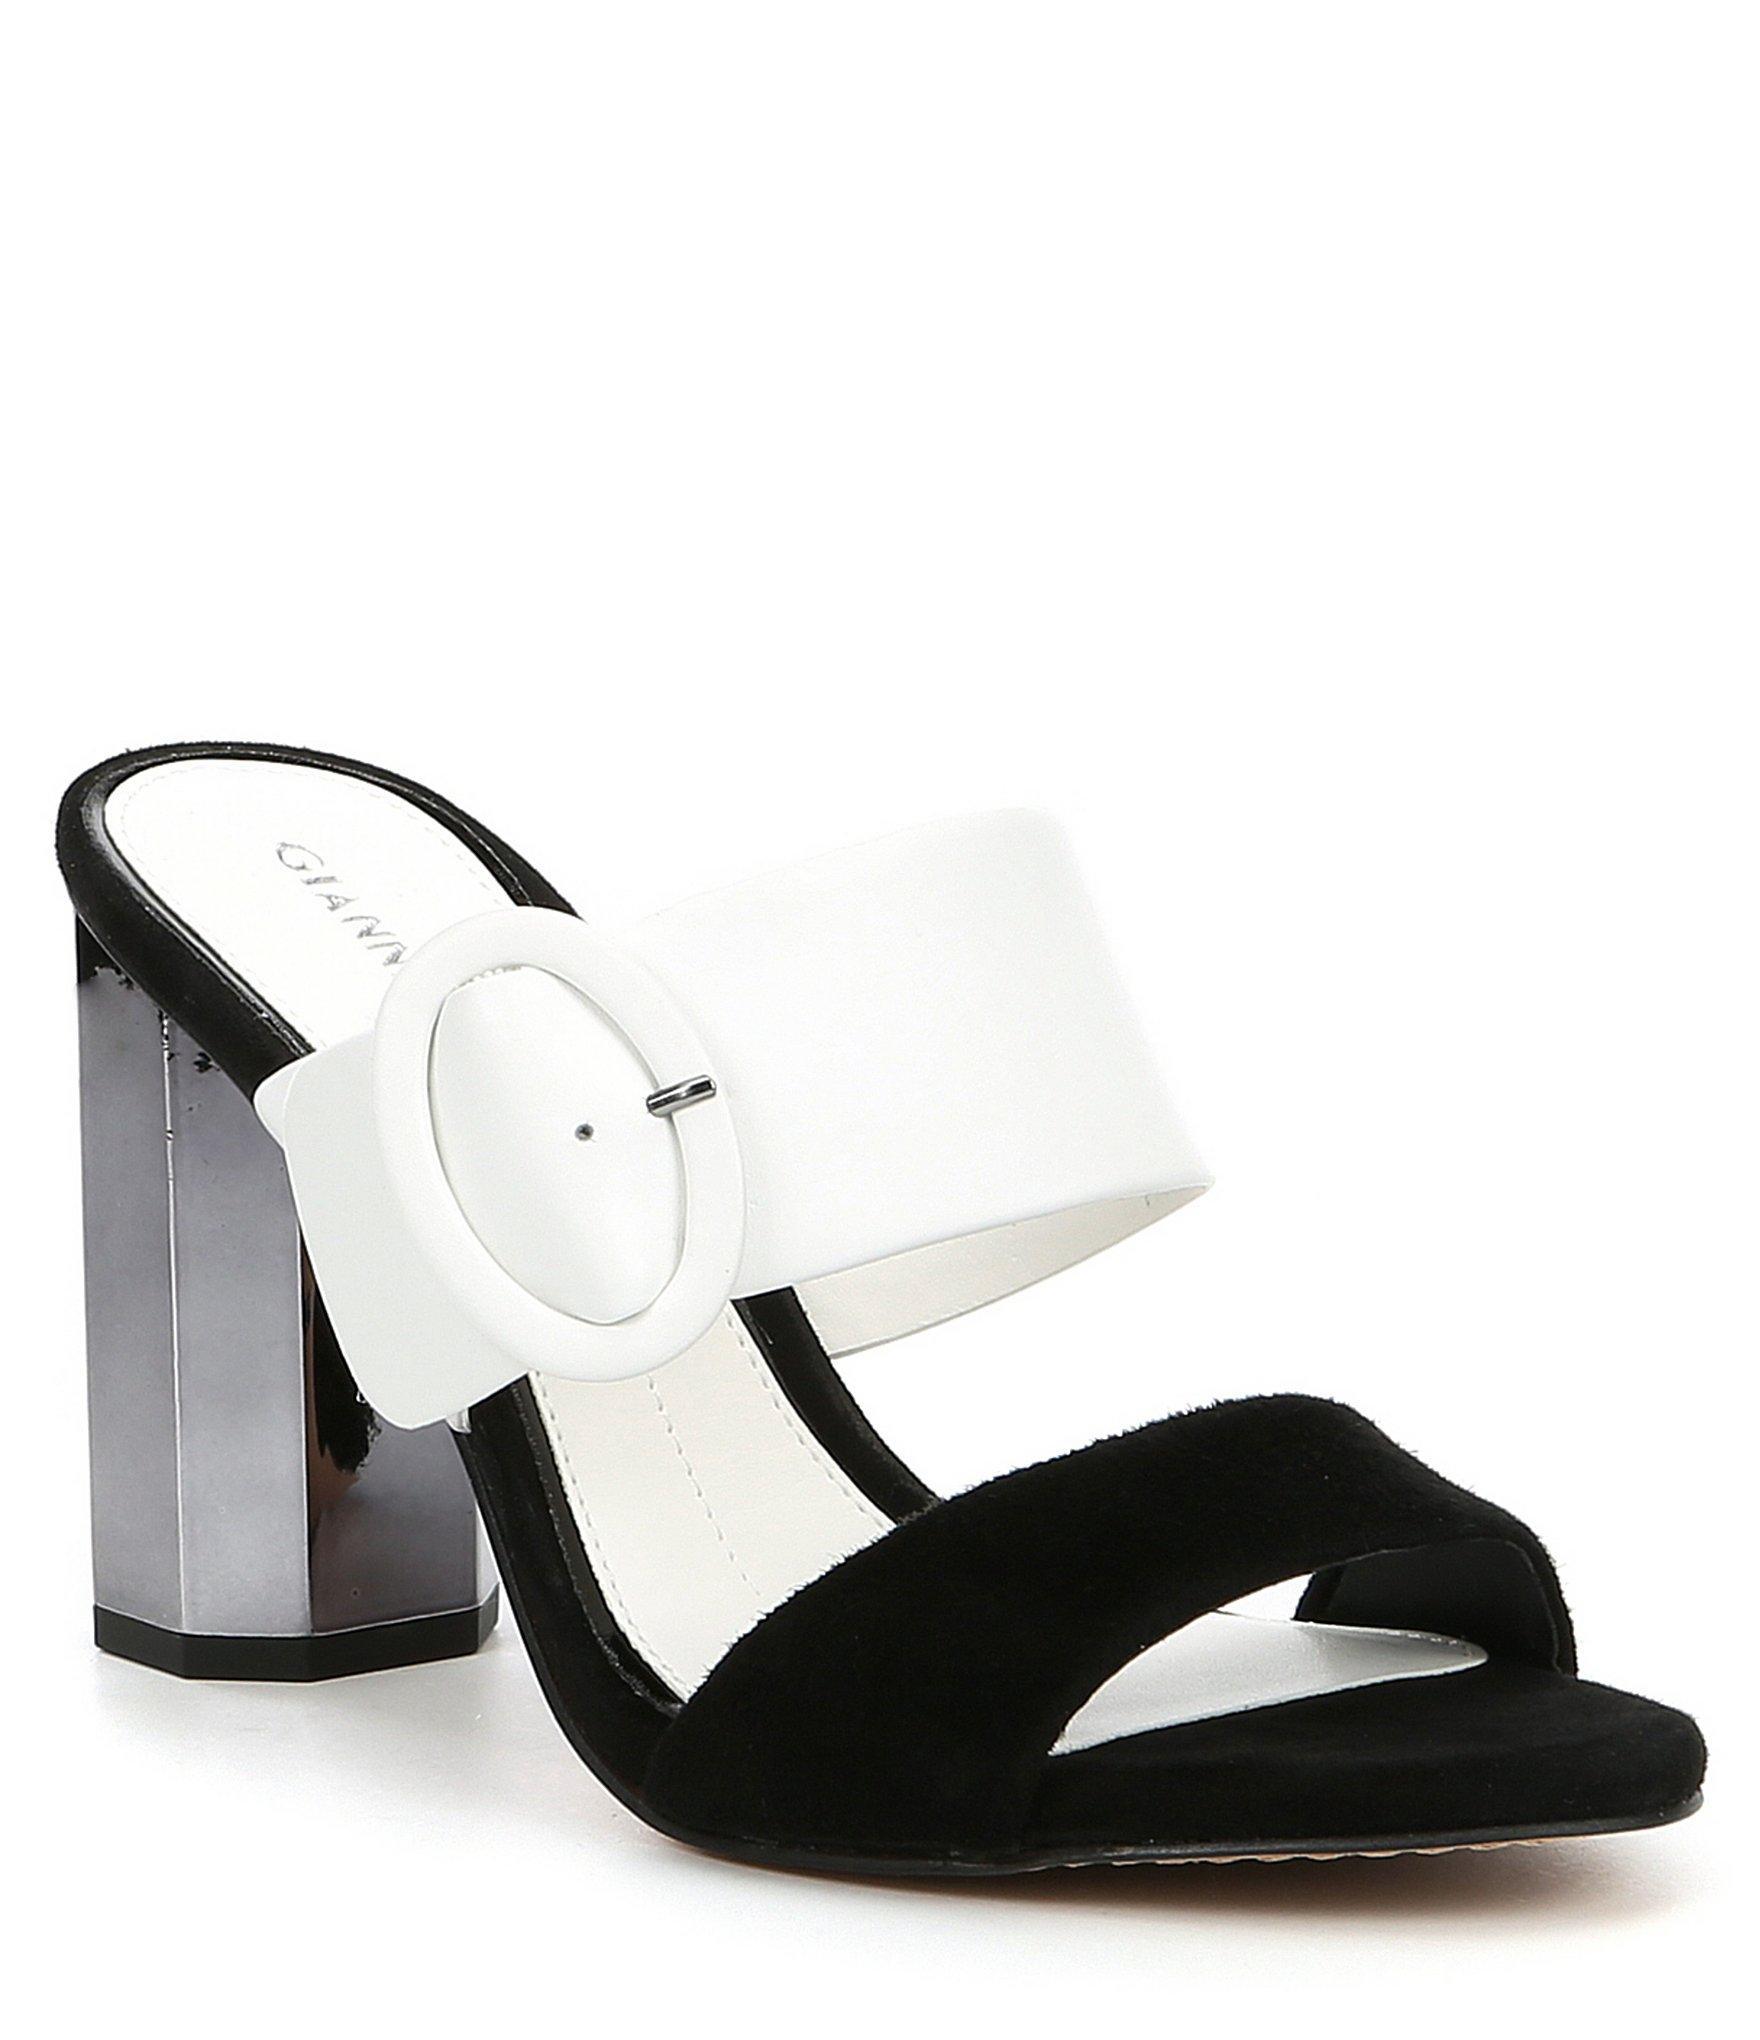 072f122d0fd Lyst - Gianni Bini Ramey Colorblock Block Heel Mules in Black